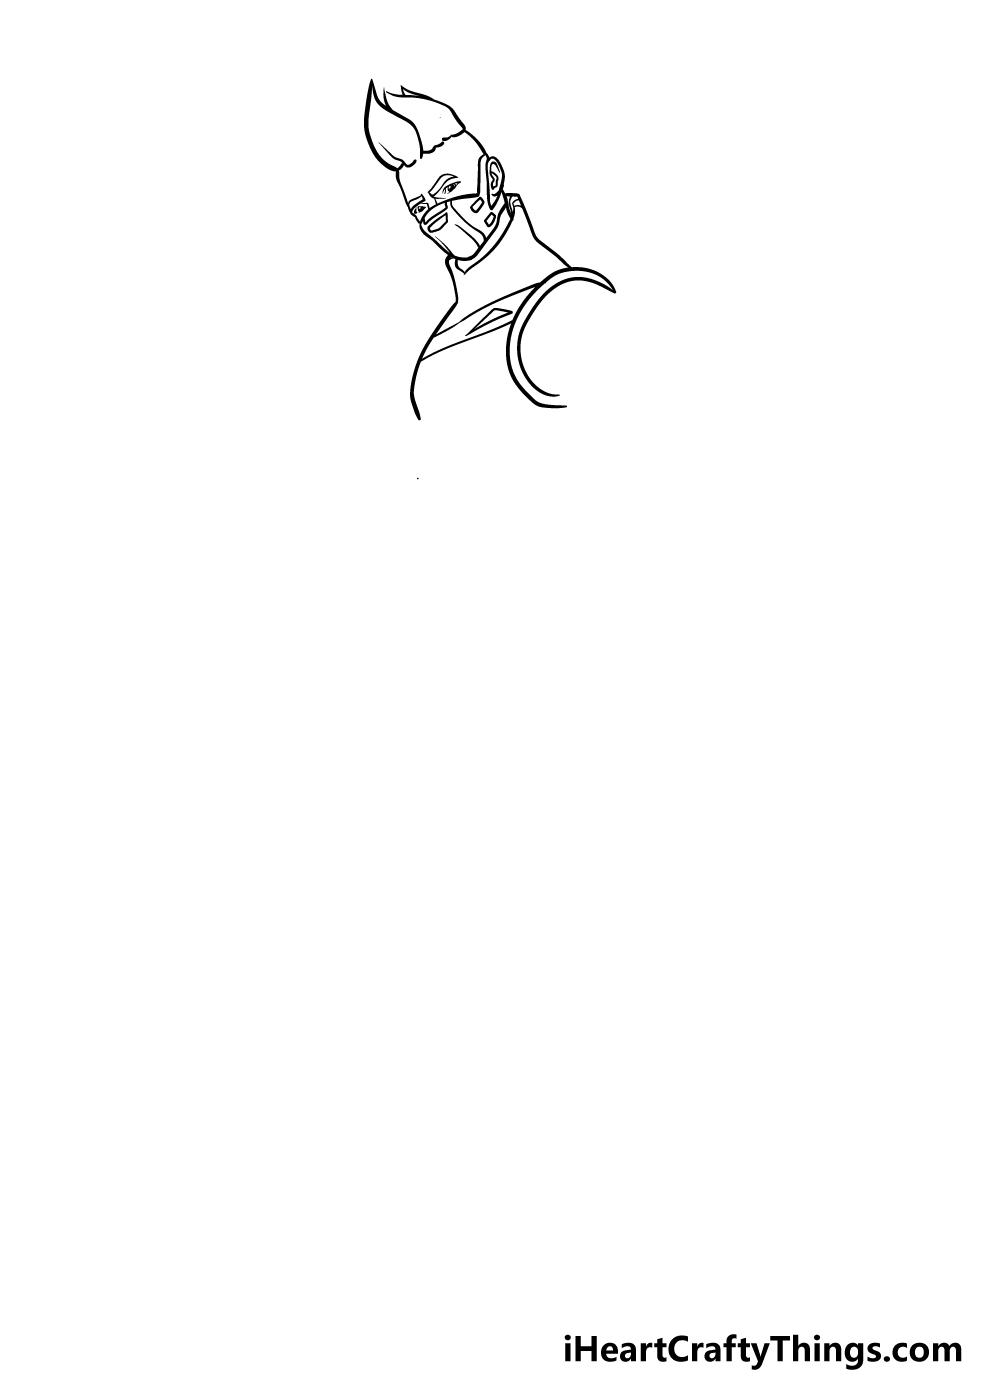 fortnite drawing step 4